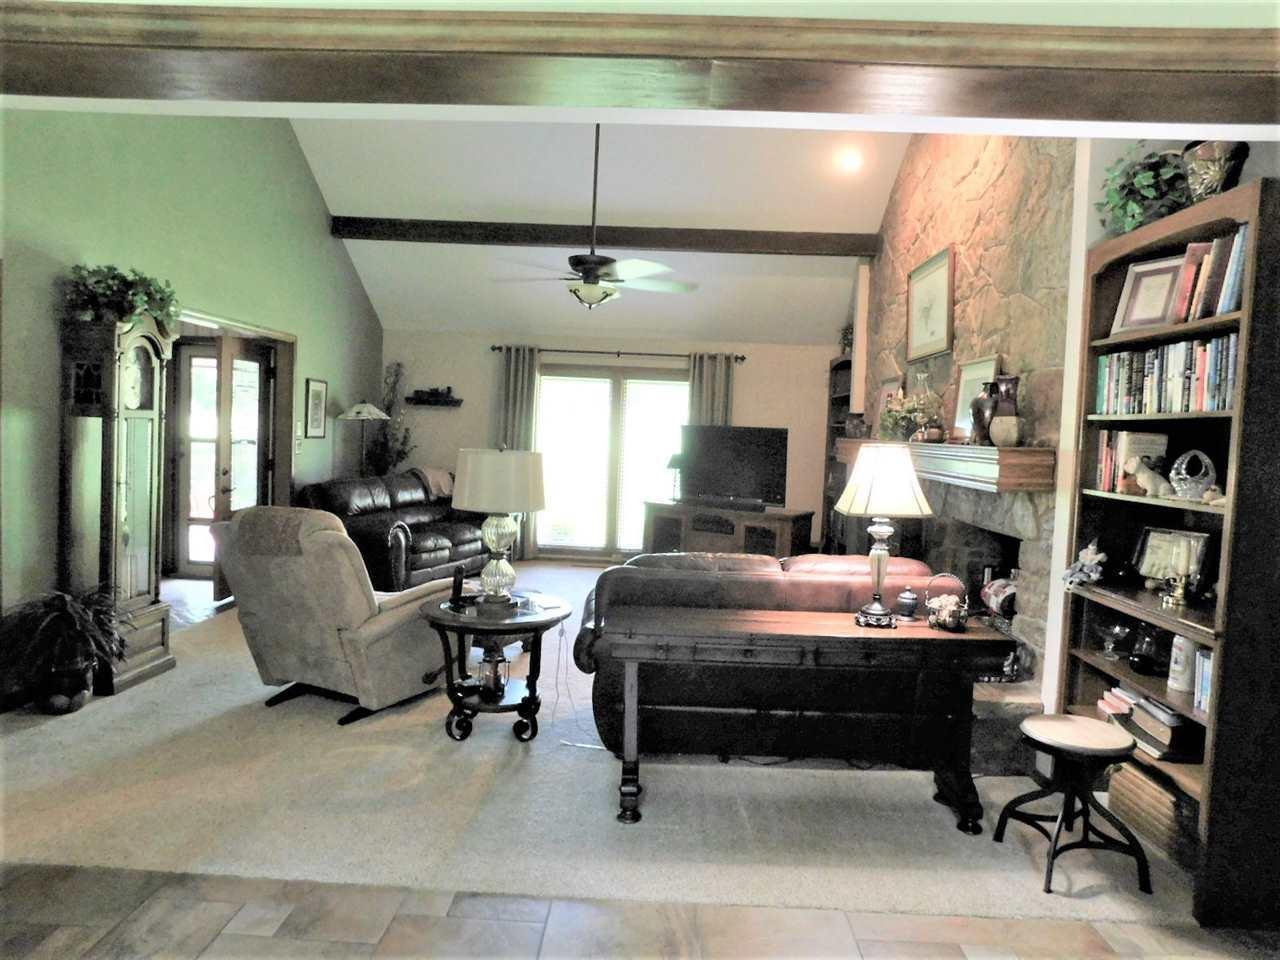 Sold Intraoffice W/MLS | 279 Braden School Rd.  Ponca City, OK 74604 3